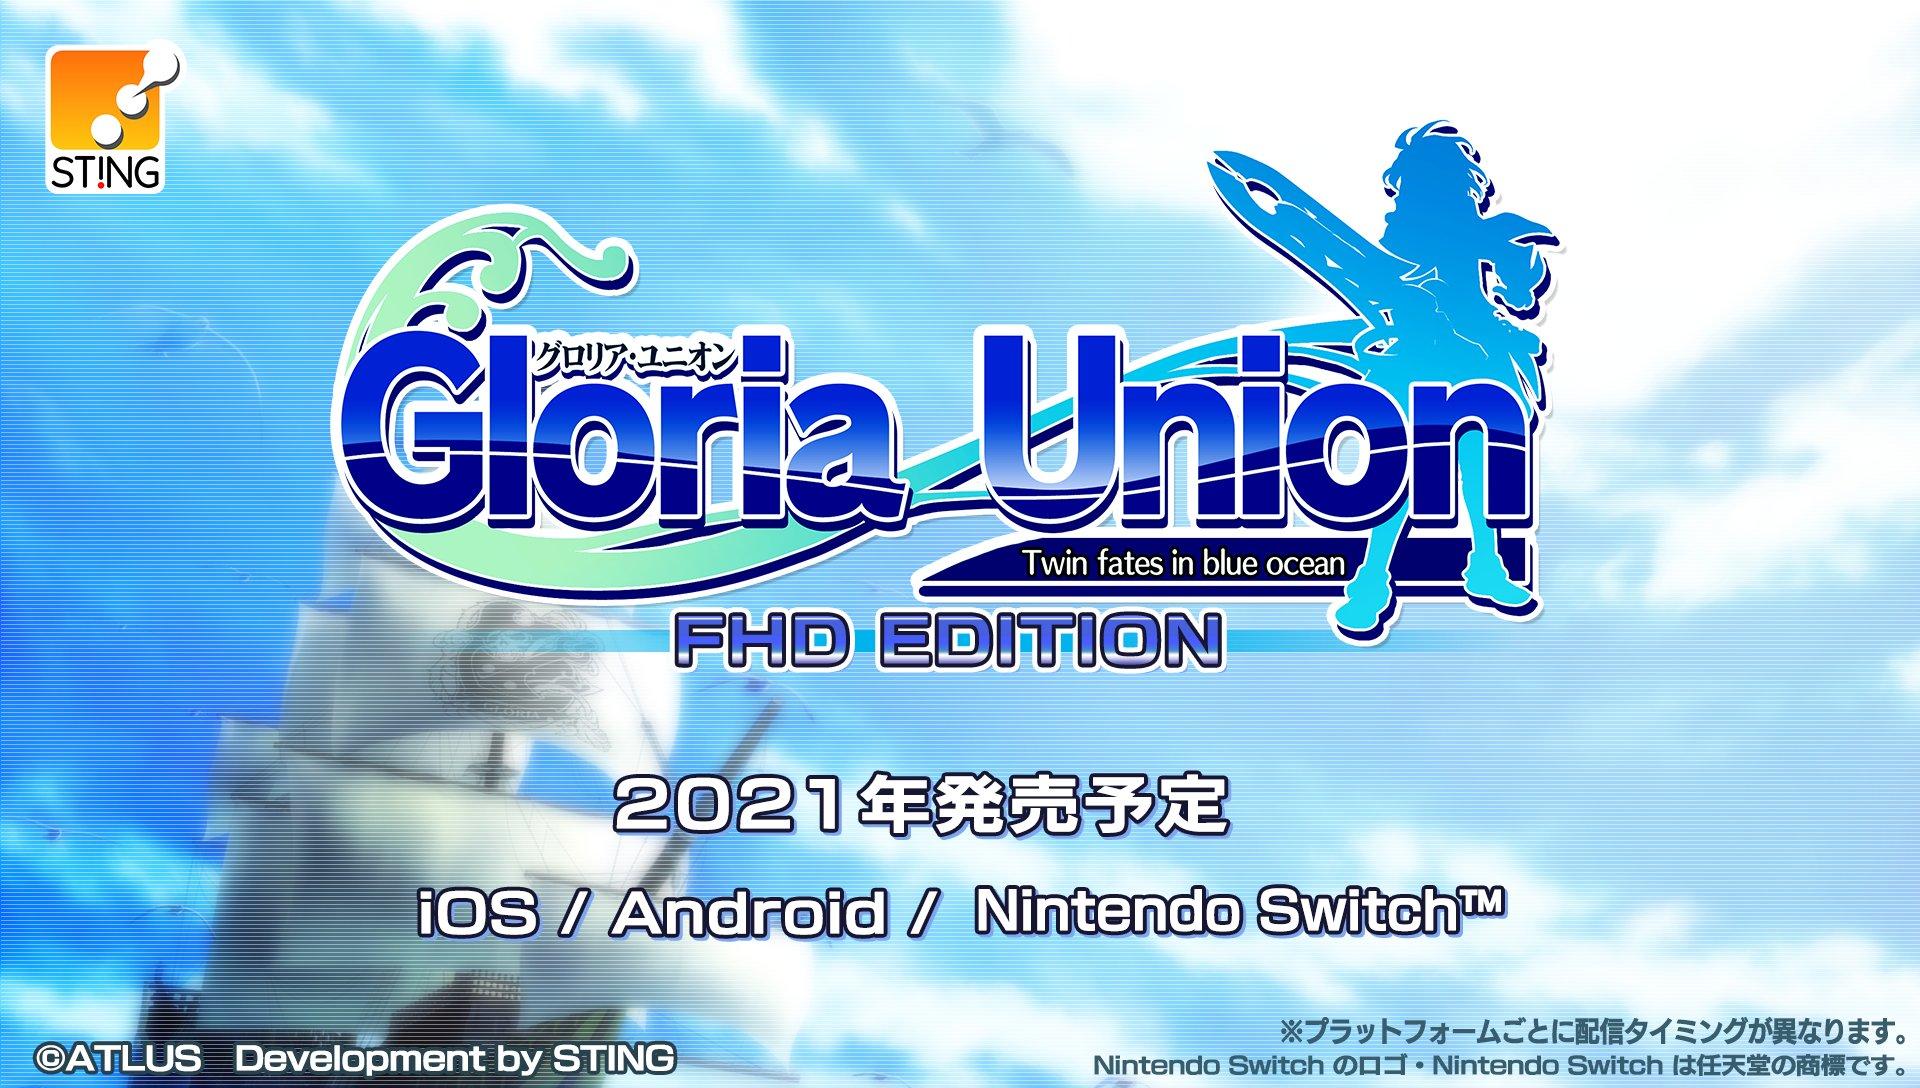 PSP经典SRPG游戏《光辉同盟》明年推出高清版